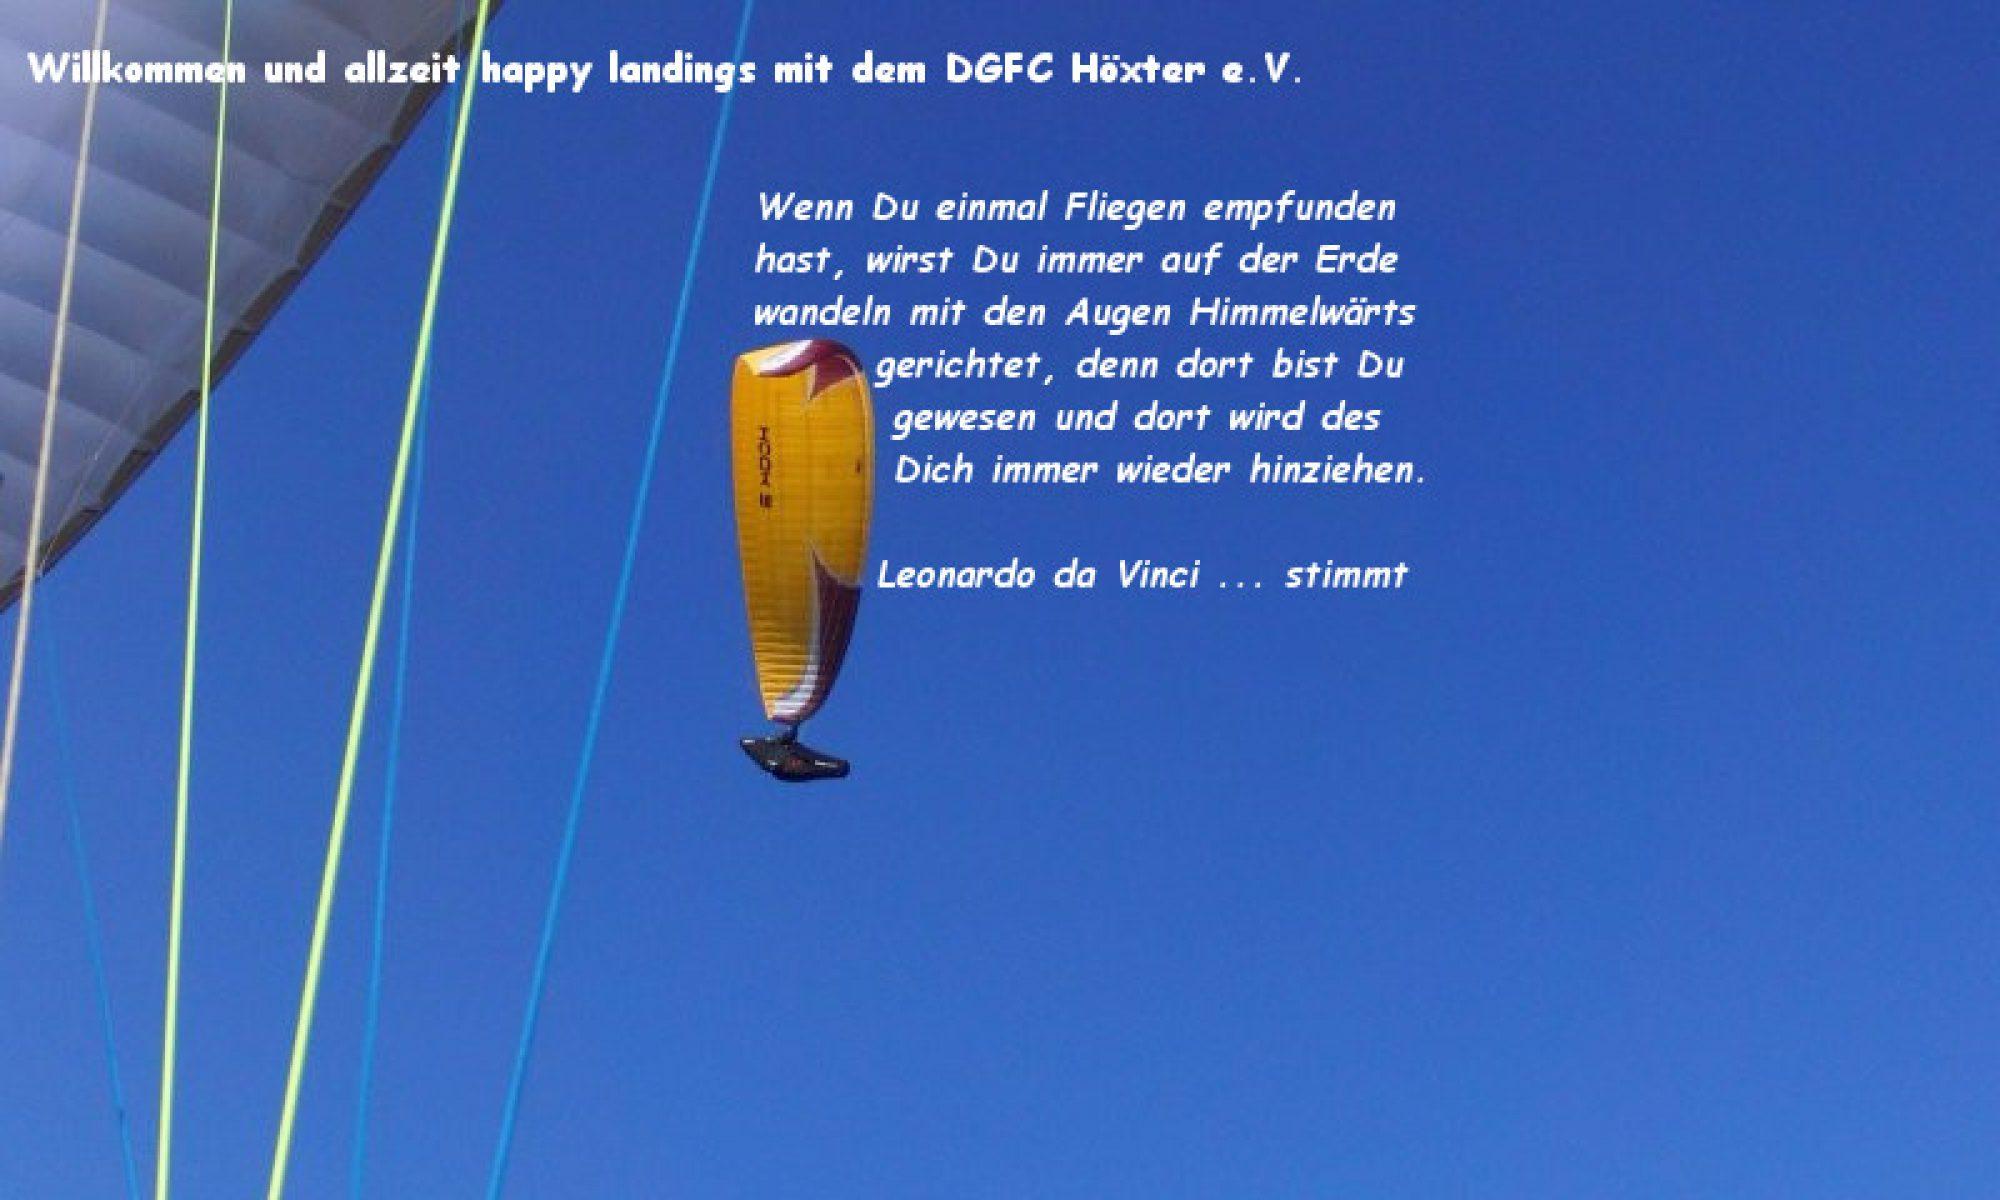 DGFC Höxter e.V.